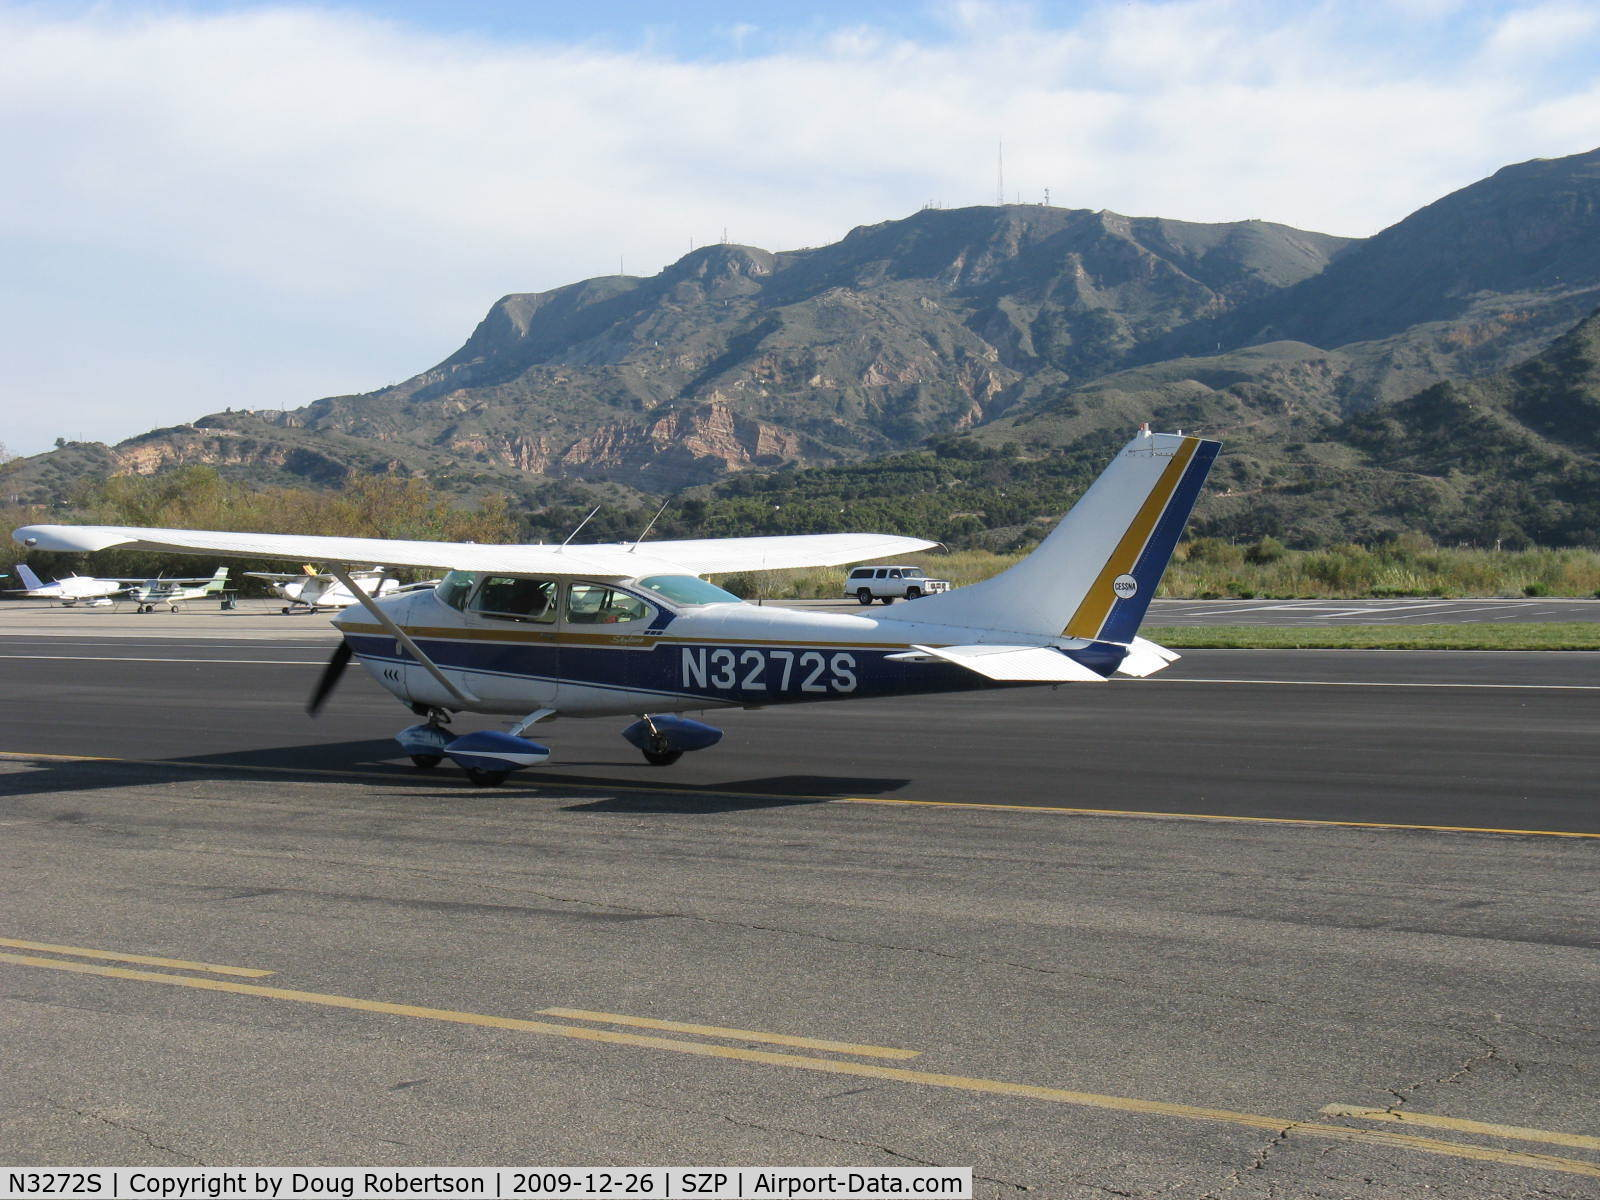 N3272S, 1964 Cessna 182G Skylane C/N 18255772, 1964 Cessna 182G SKYLANE, Continental O-470-S 230 Hp, taxi back